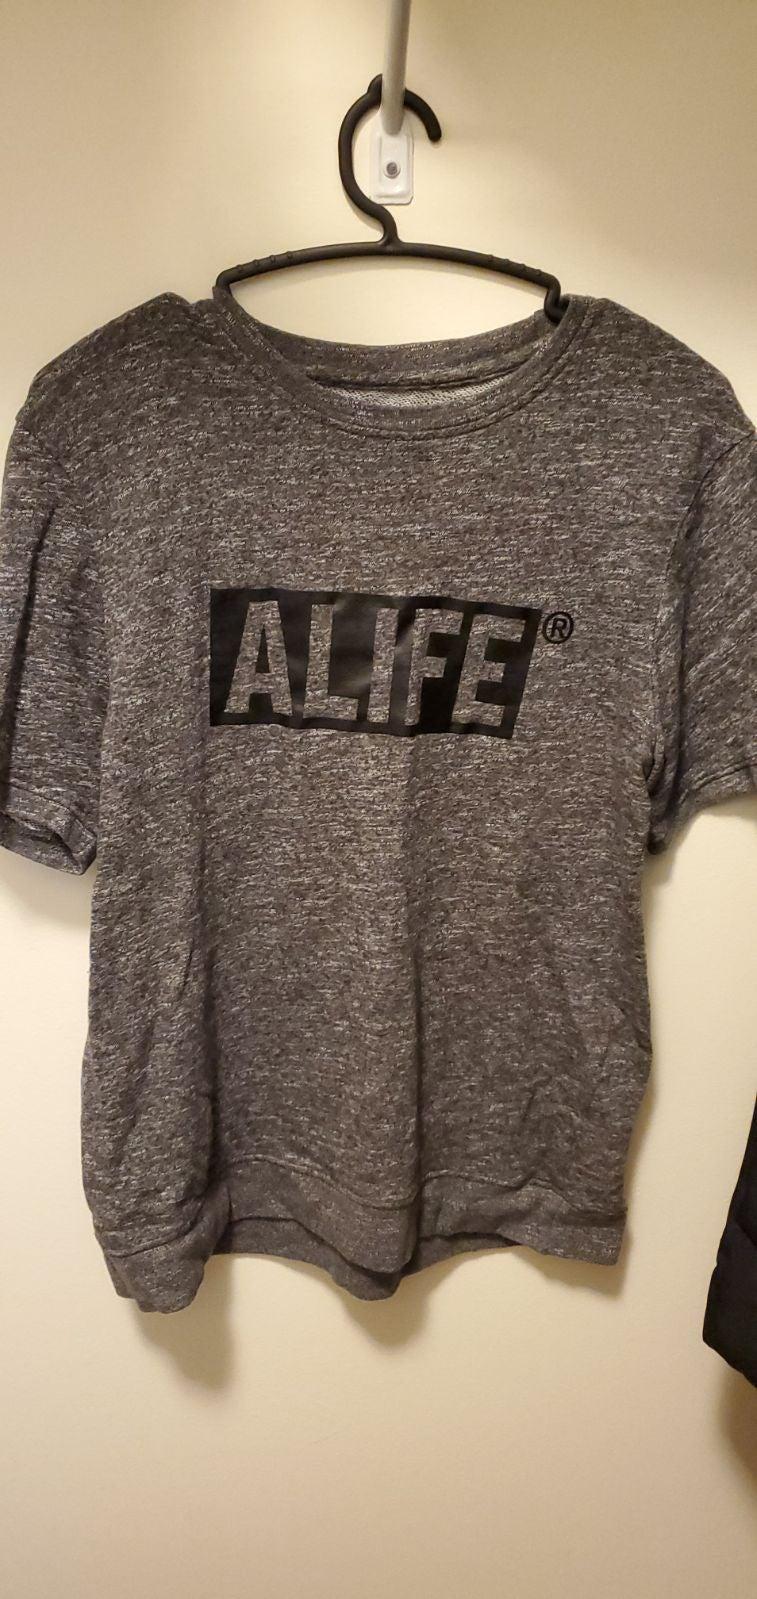 ALIFE discontinued Street wear BNWOT